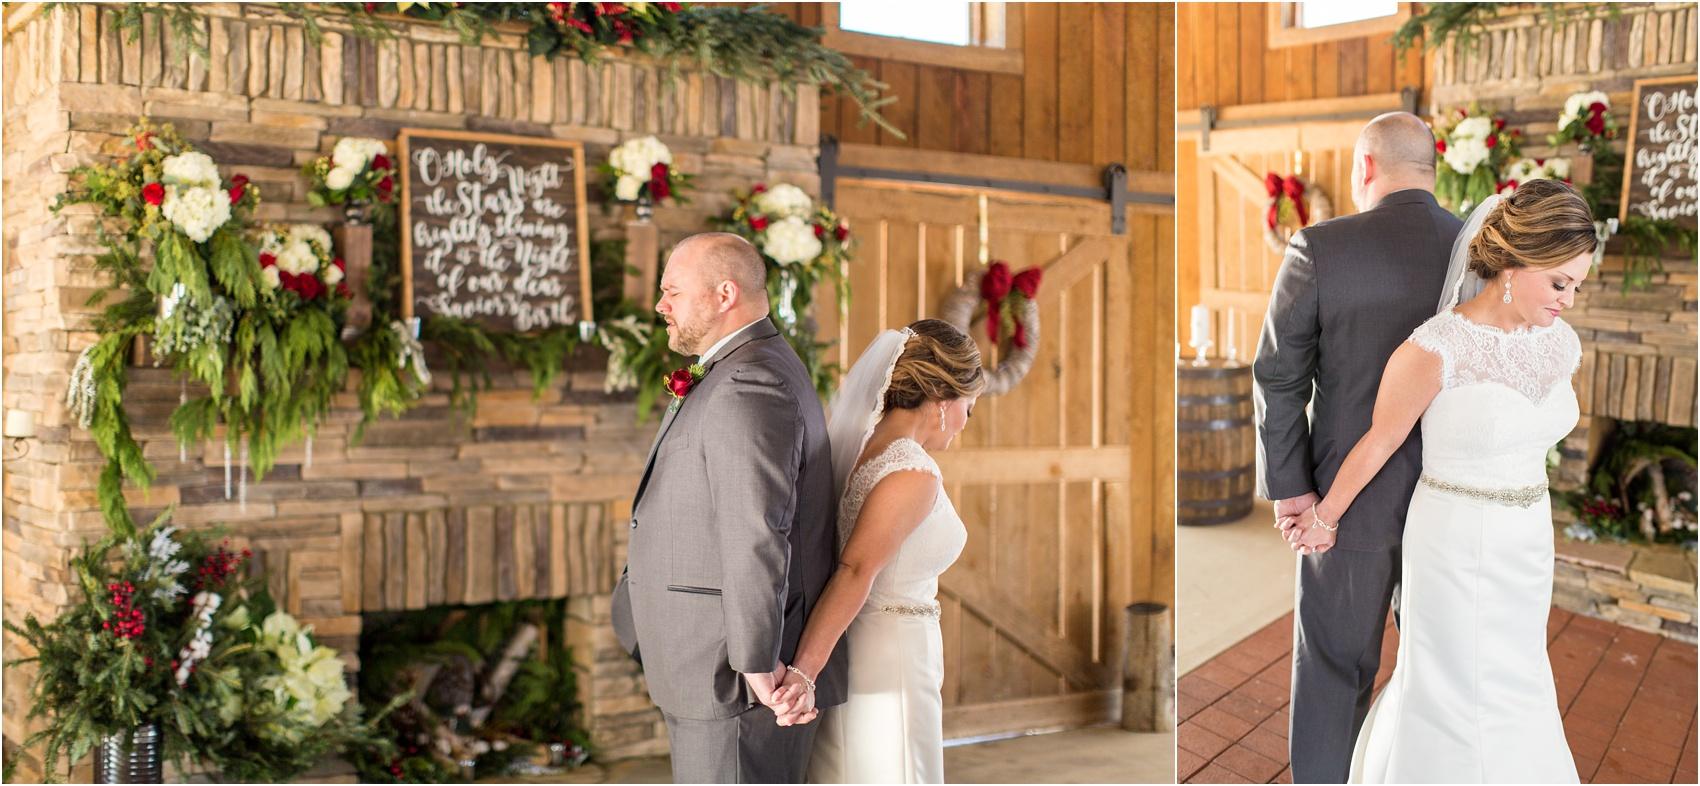 Savannah Eve Photography- Page Wedding Blog-23.jpg